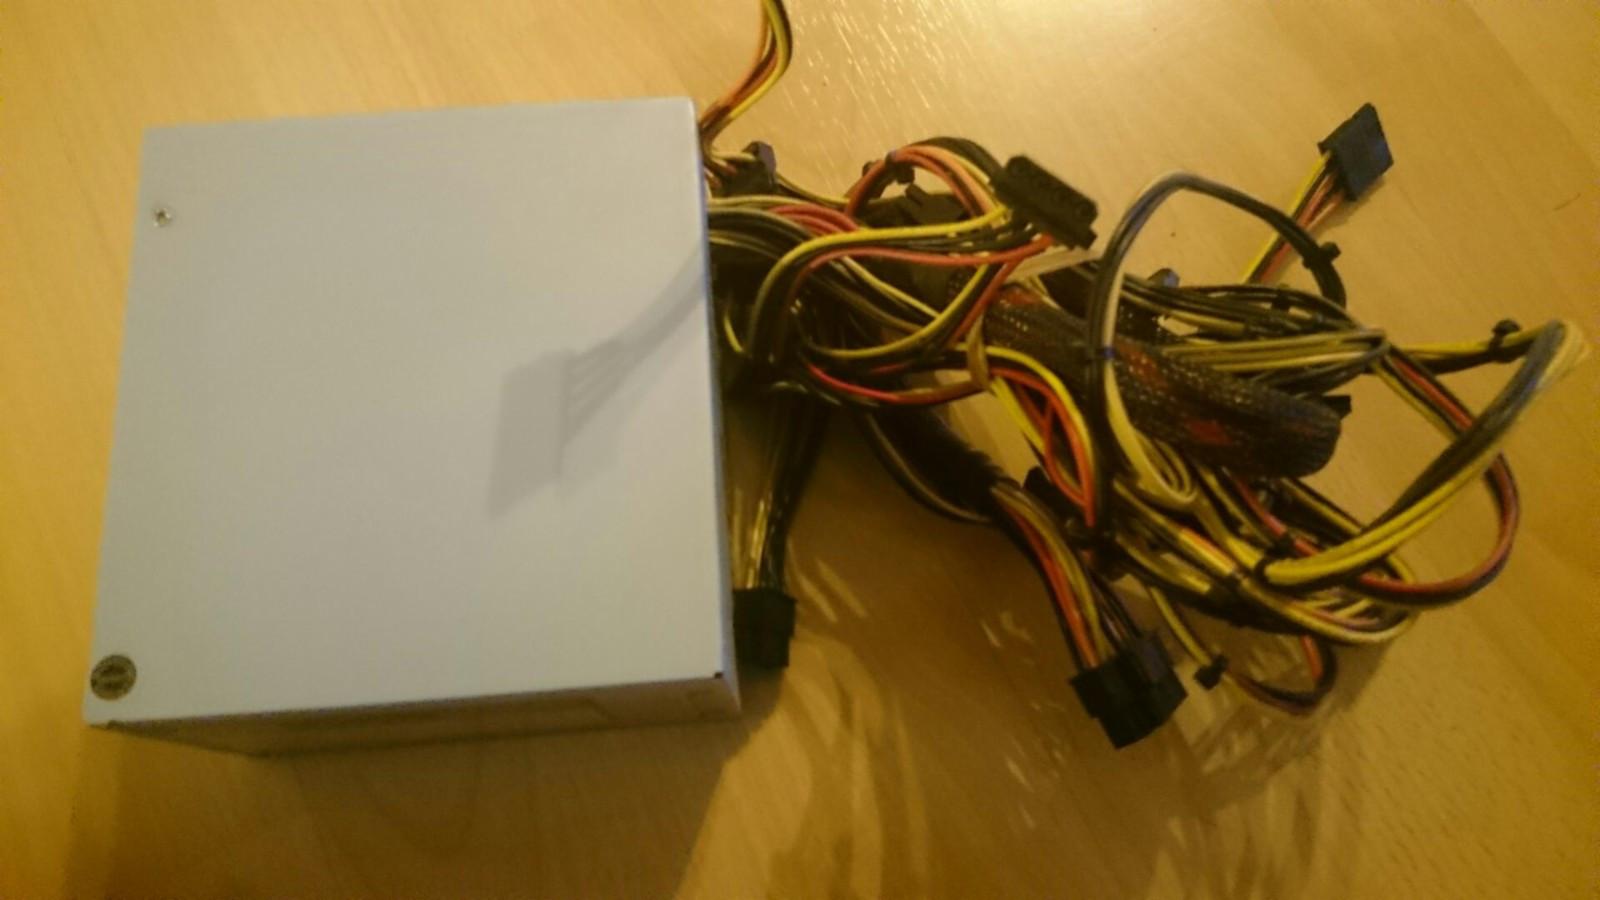 500W strømforsyning til PC - Hagan  - En brukt, men velfungerende strømforsyning. Selger denne fordi jeg trengte en kraftigere. - Hagan